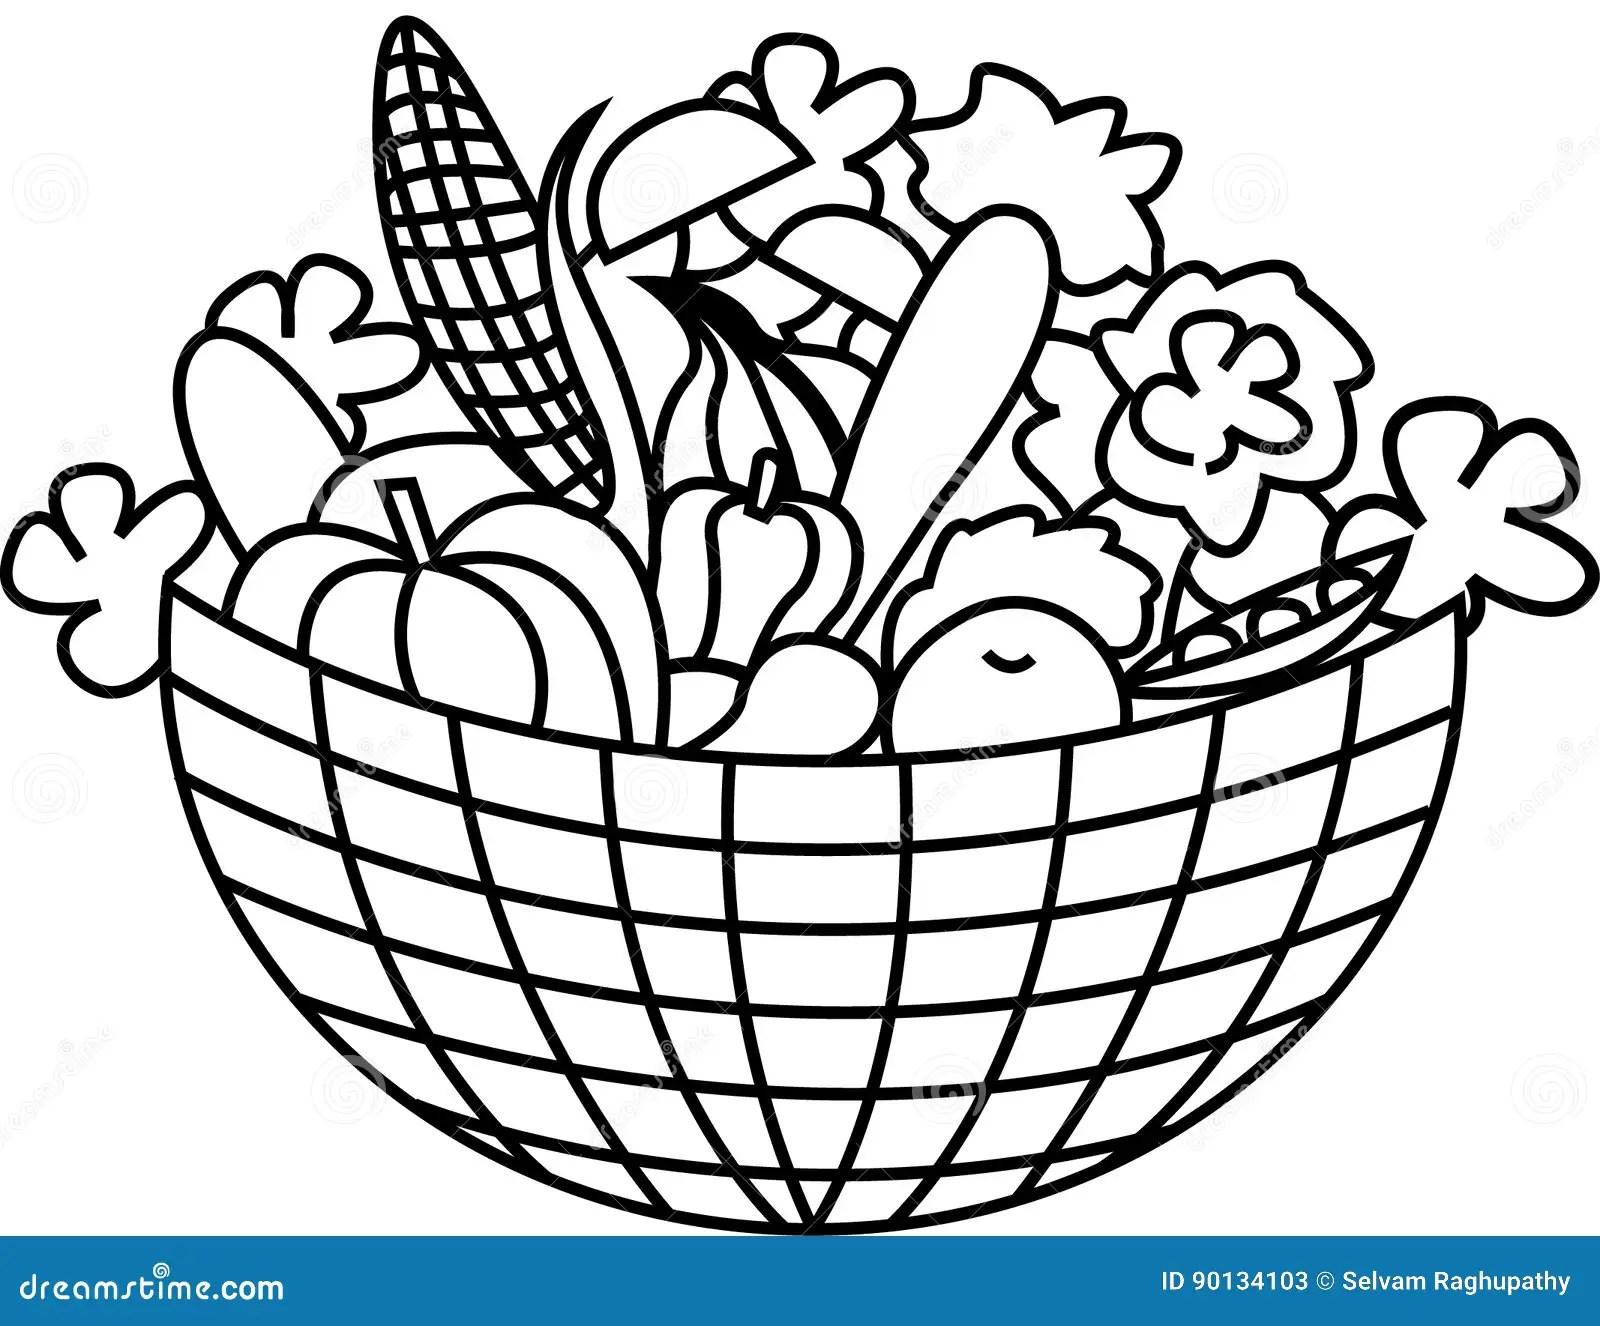 Vegetables In A Basket Stock Vector Illustration Of Corn